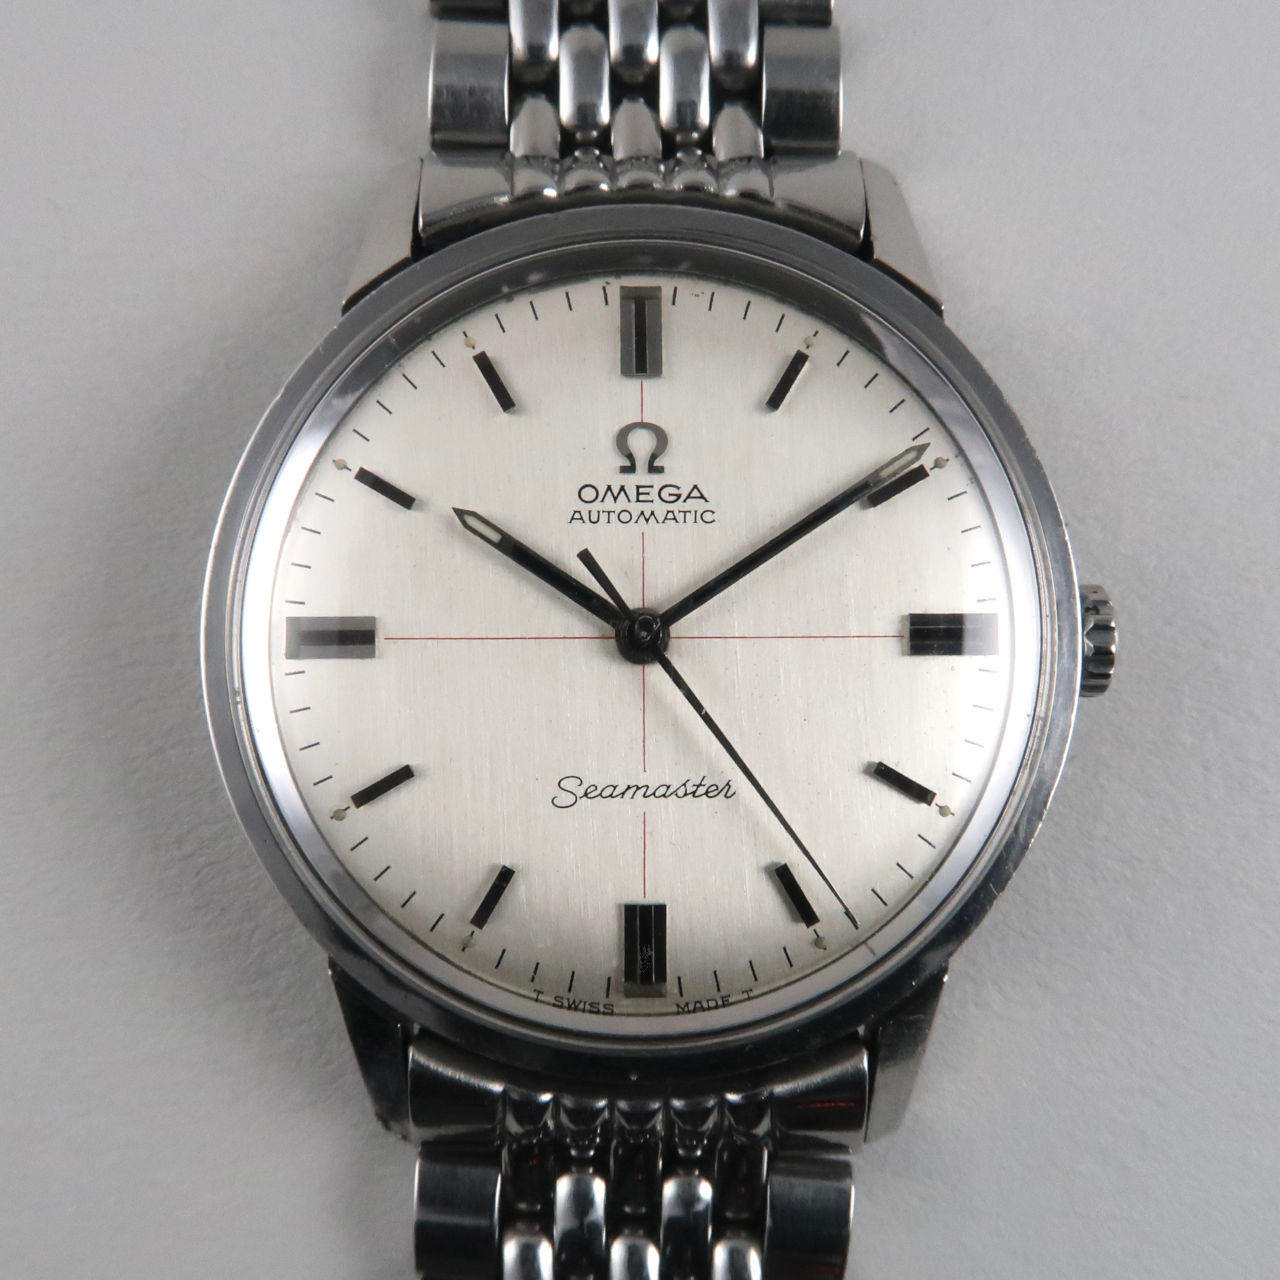 Omega Seamaster Ref.165.002 steel vintage wristwatch, circa 1966